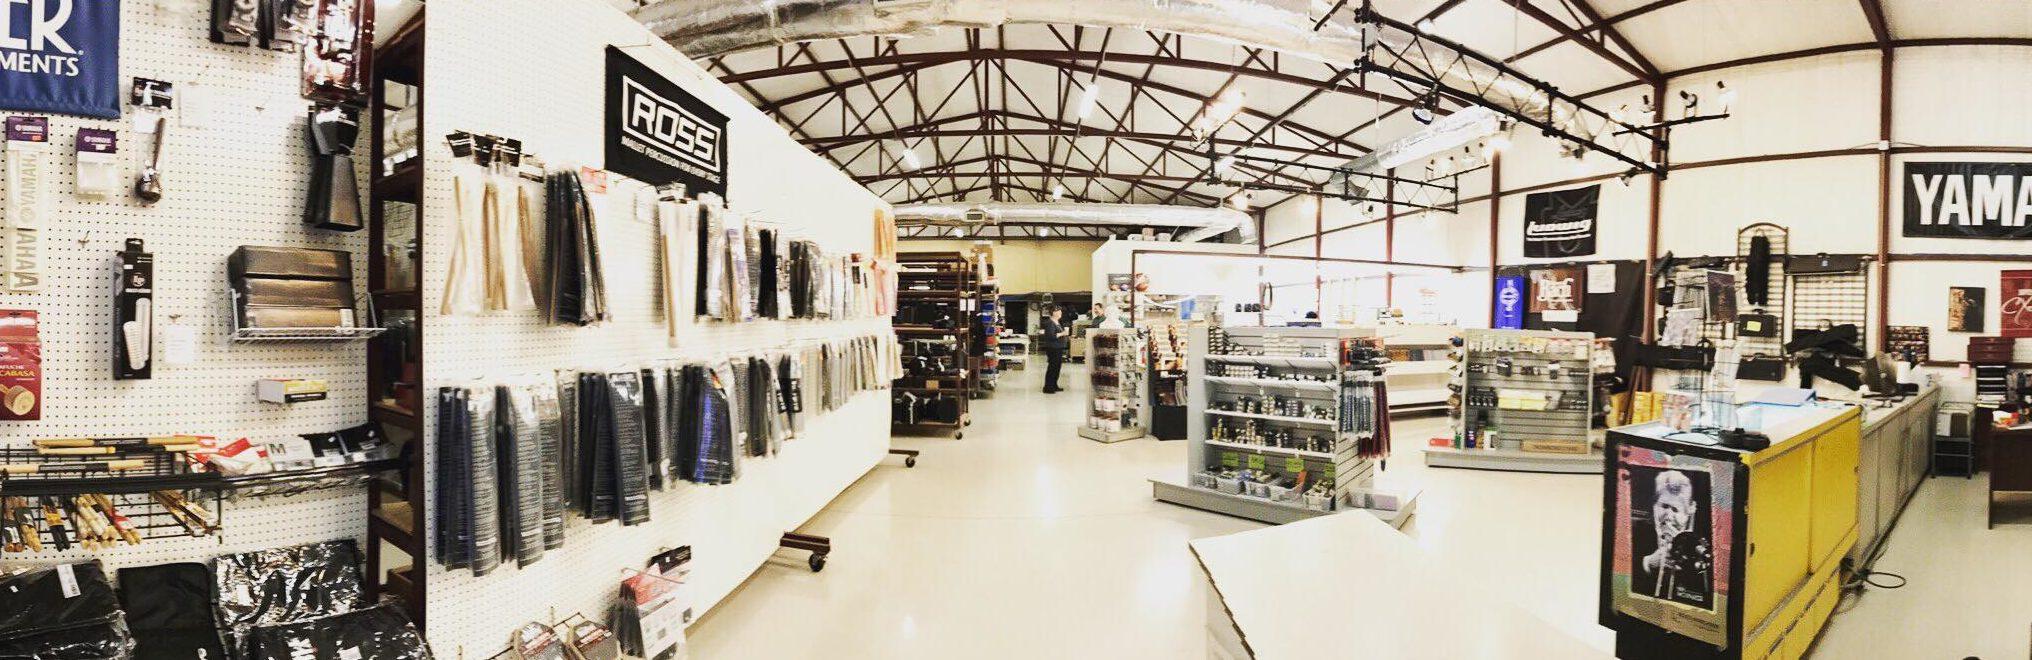 music store aledo tx